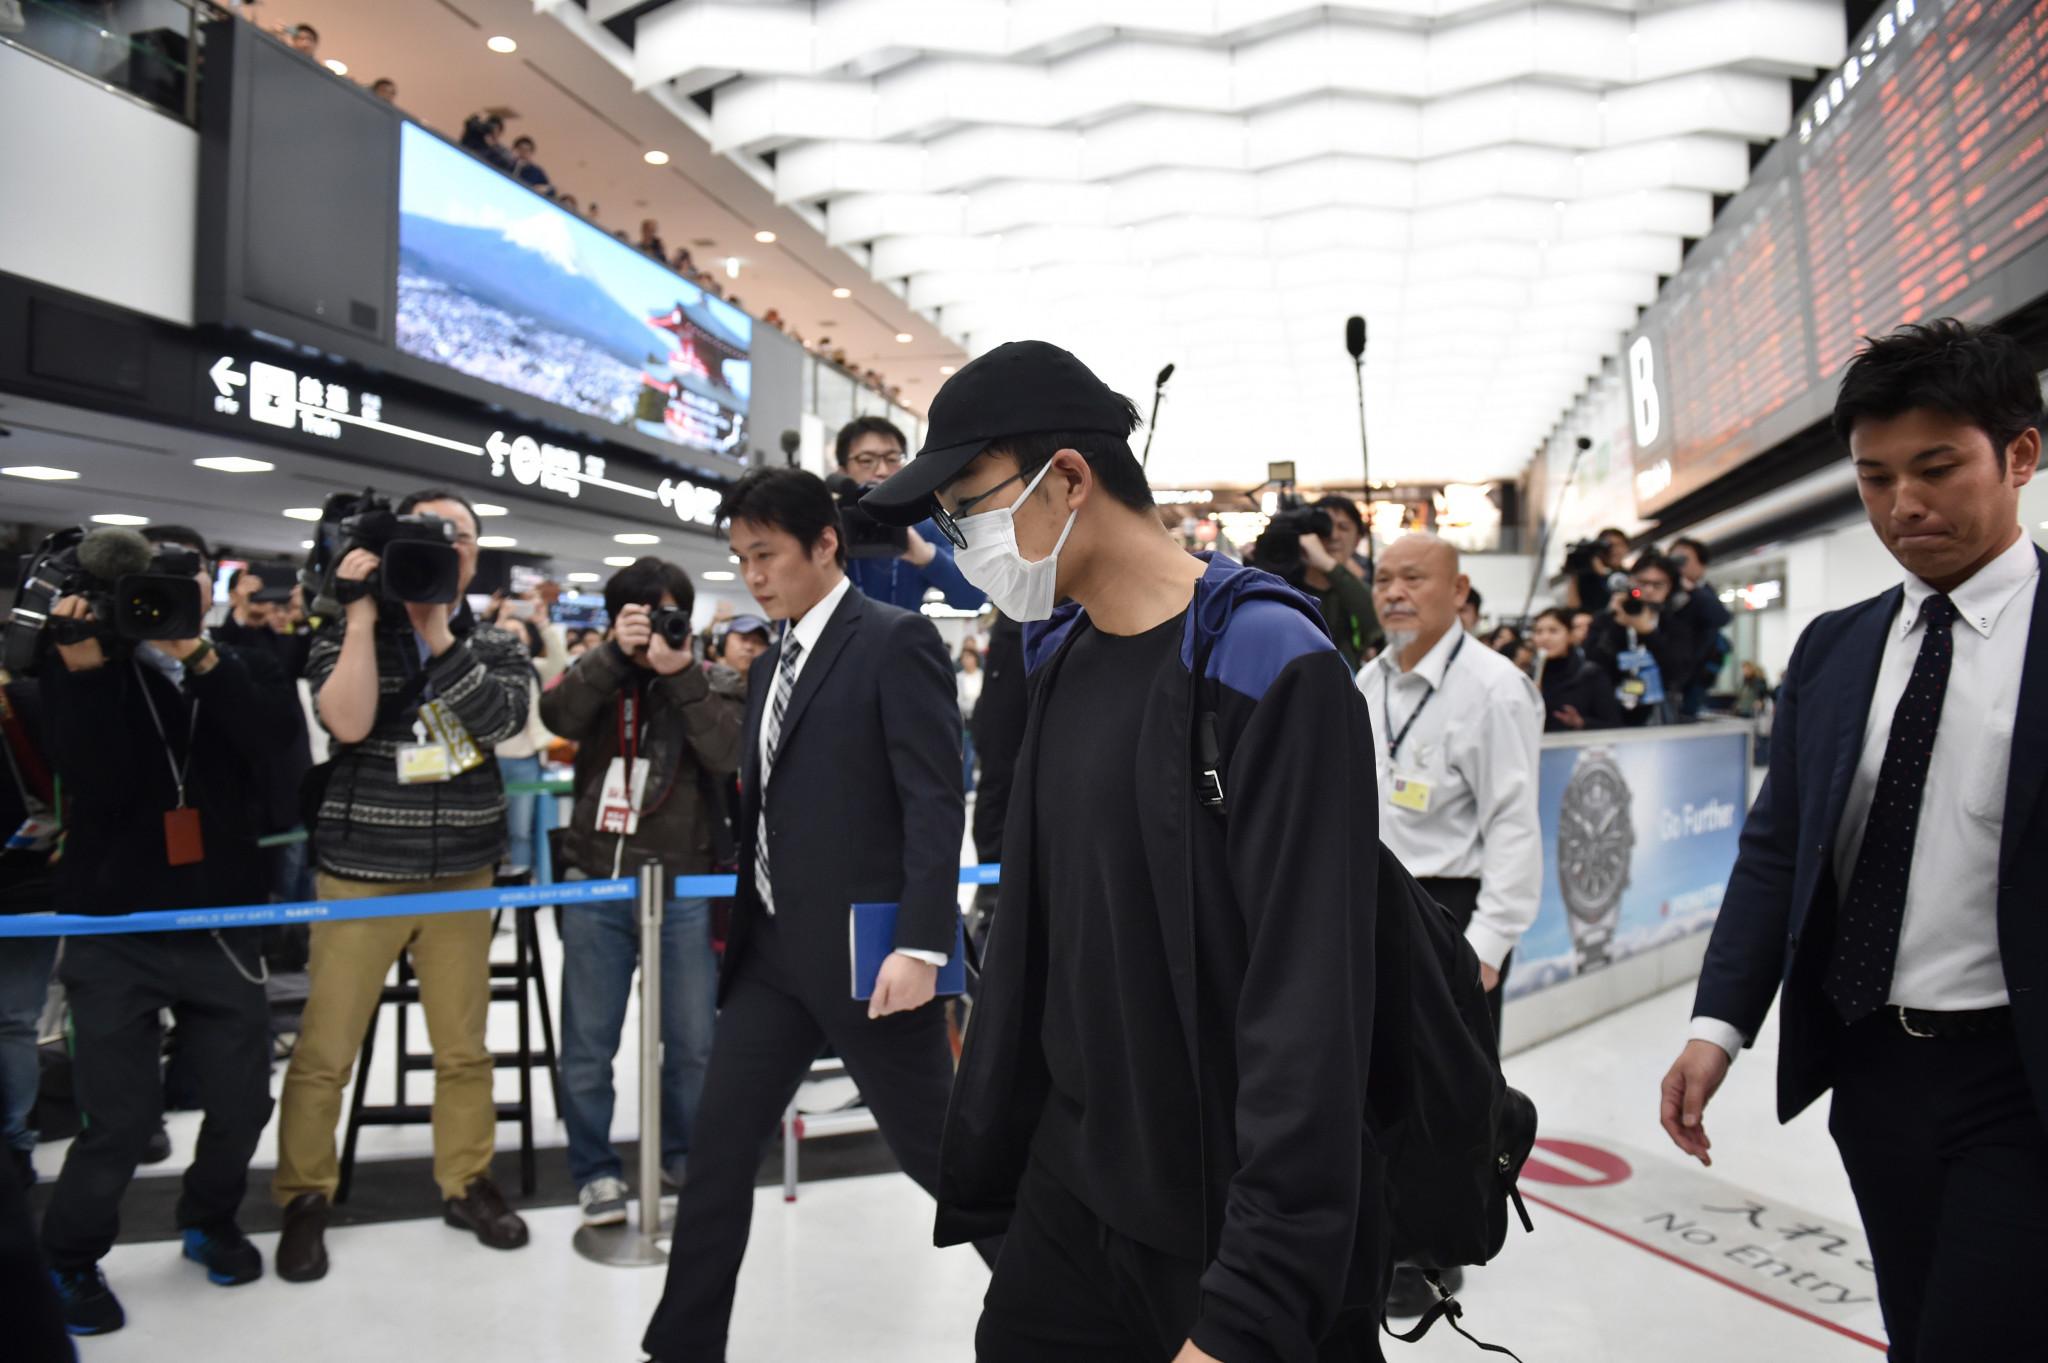 Kento Momota arriving at Tokyo's Narita Airport ©Getty Images